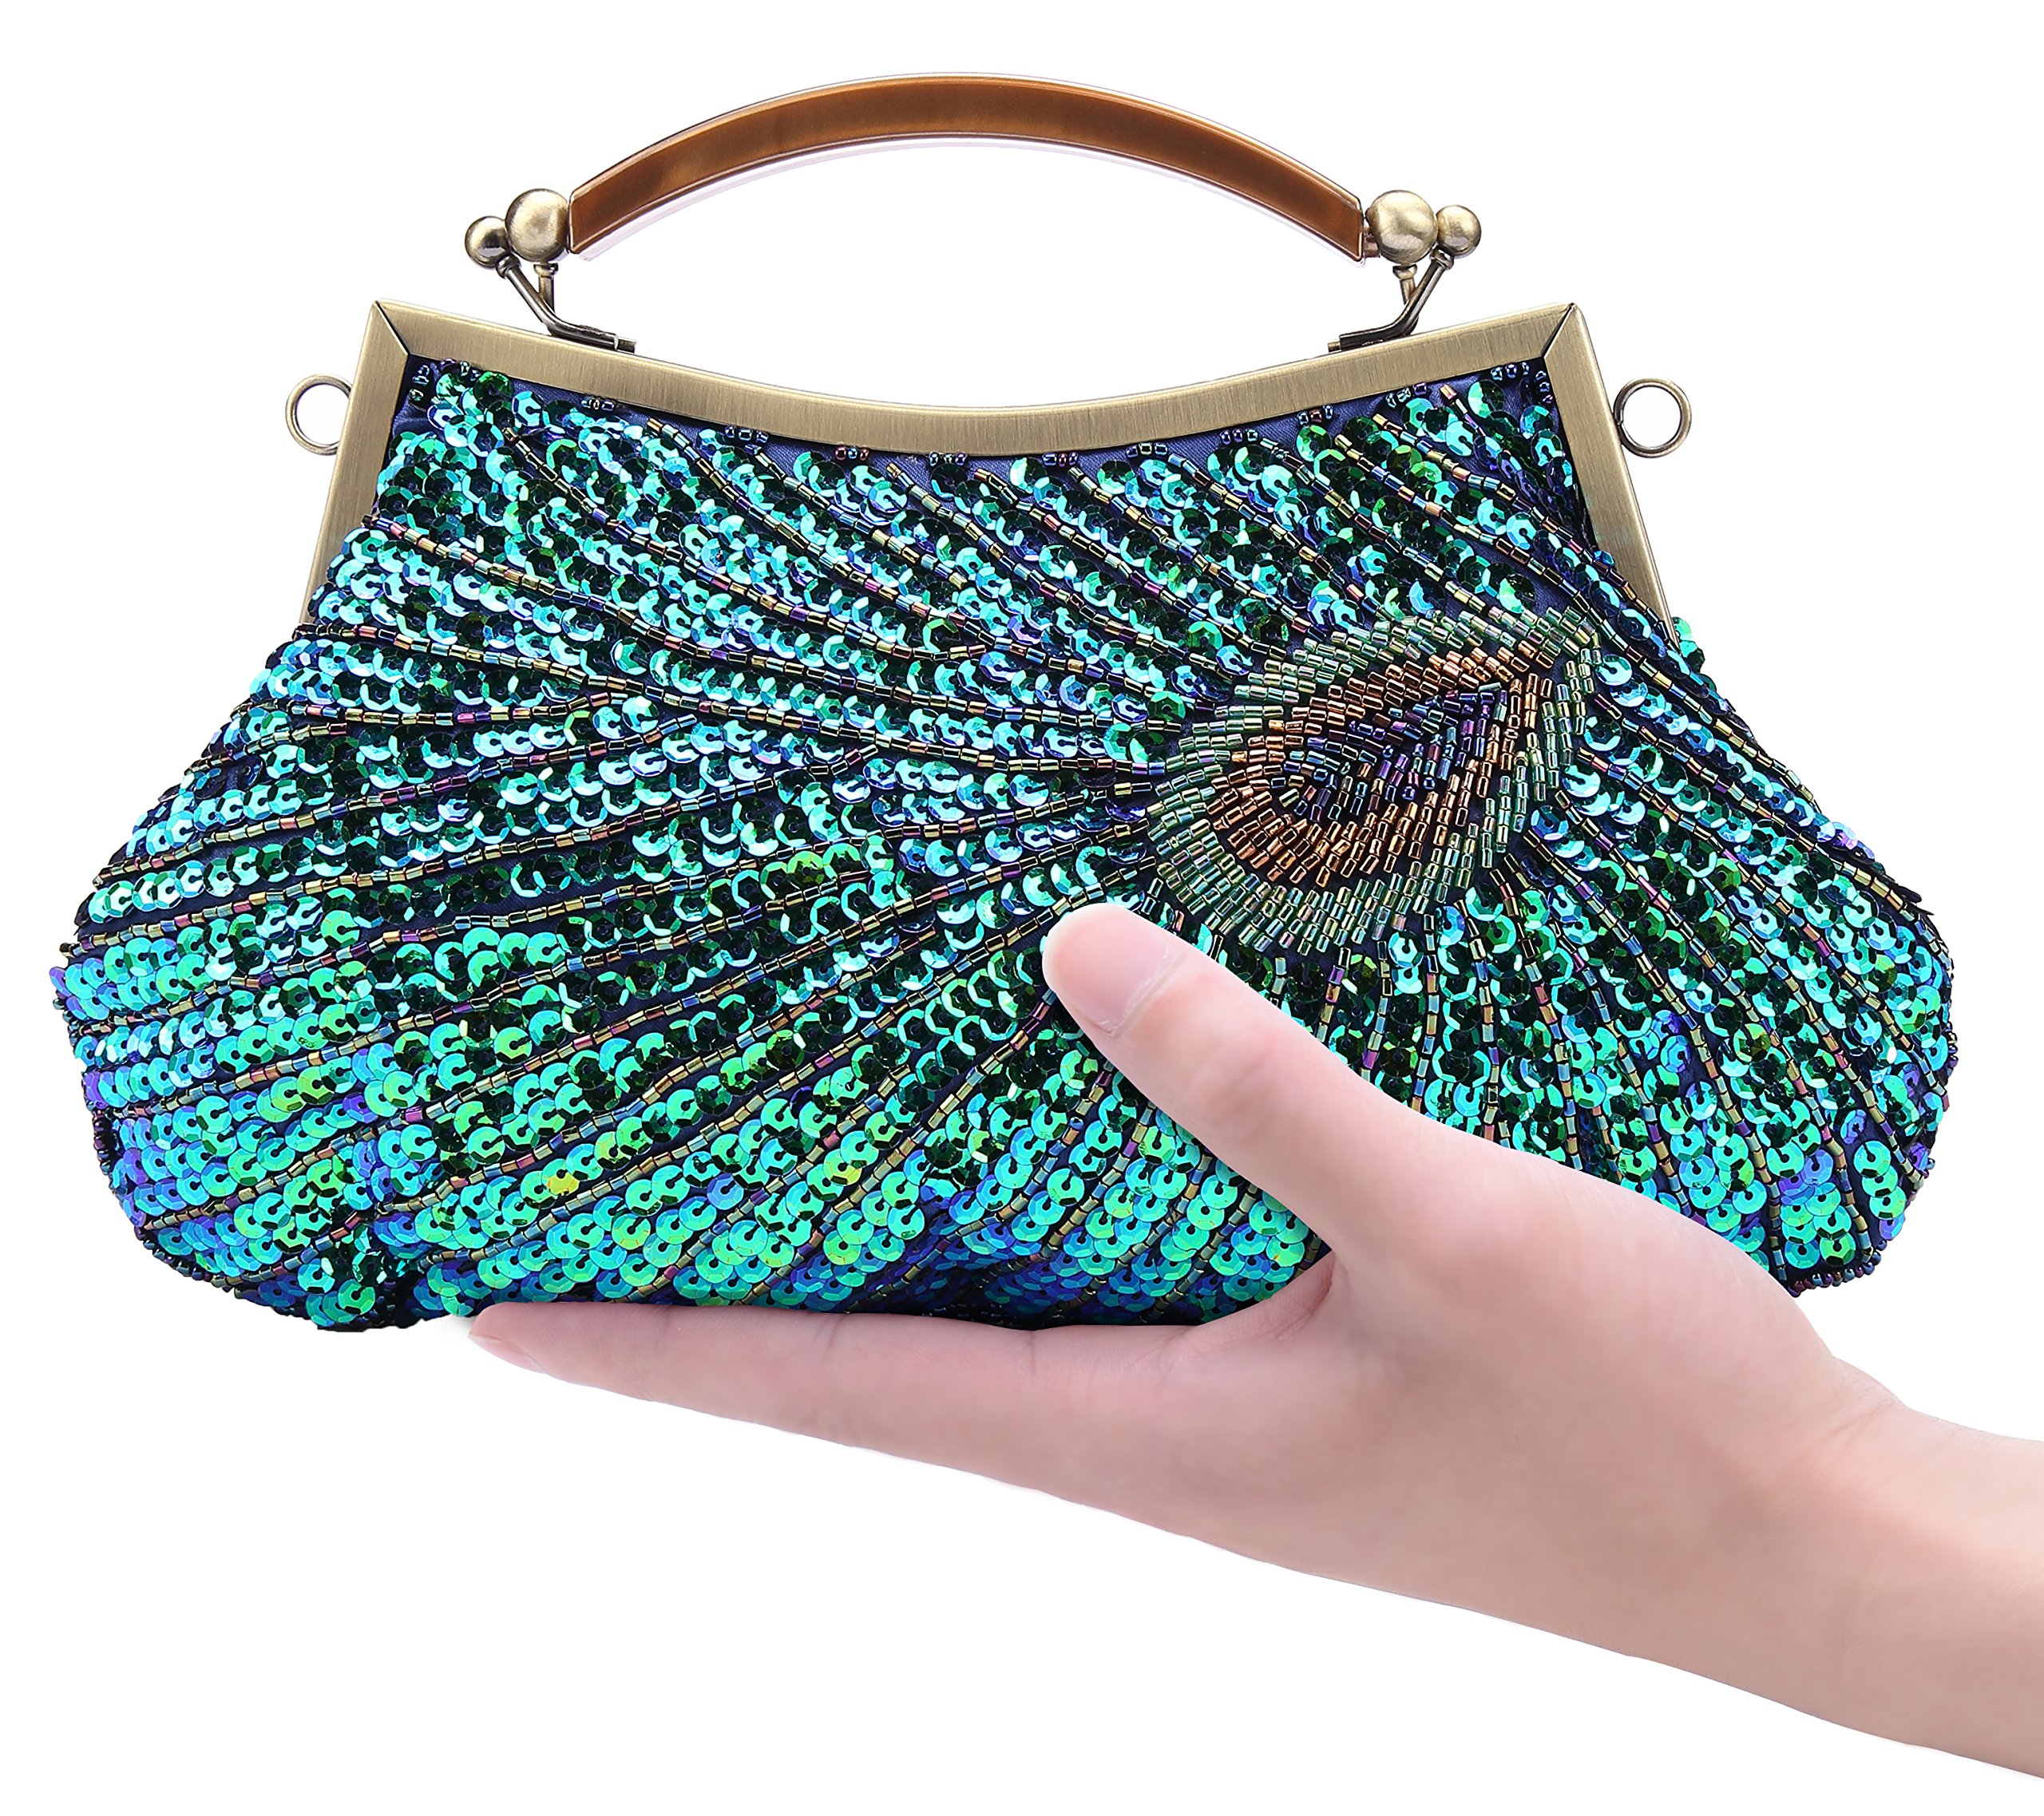 Pulama Woman Handbag Beaded Clutch PEACOCK SEQUINS Purse/Wallet/Evening Bag, Handmade for Wedding Party (Classic)